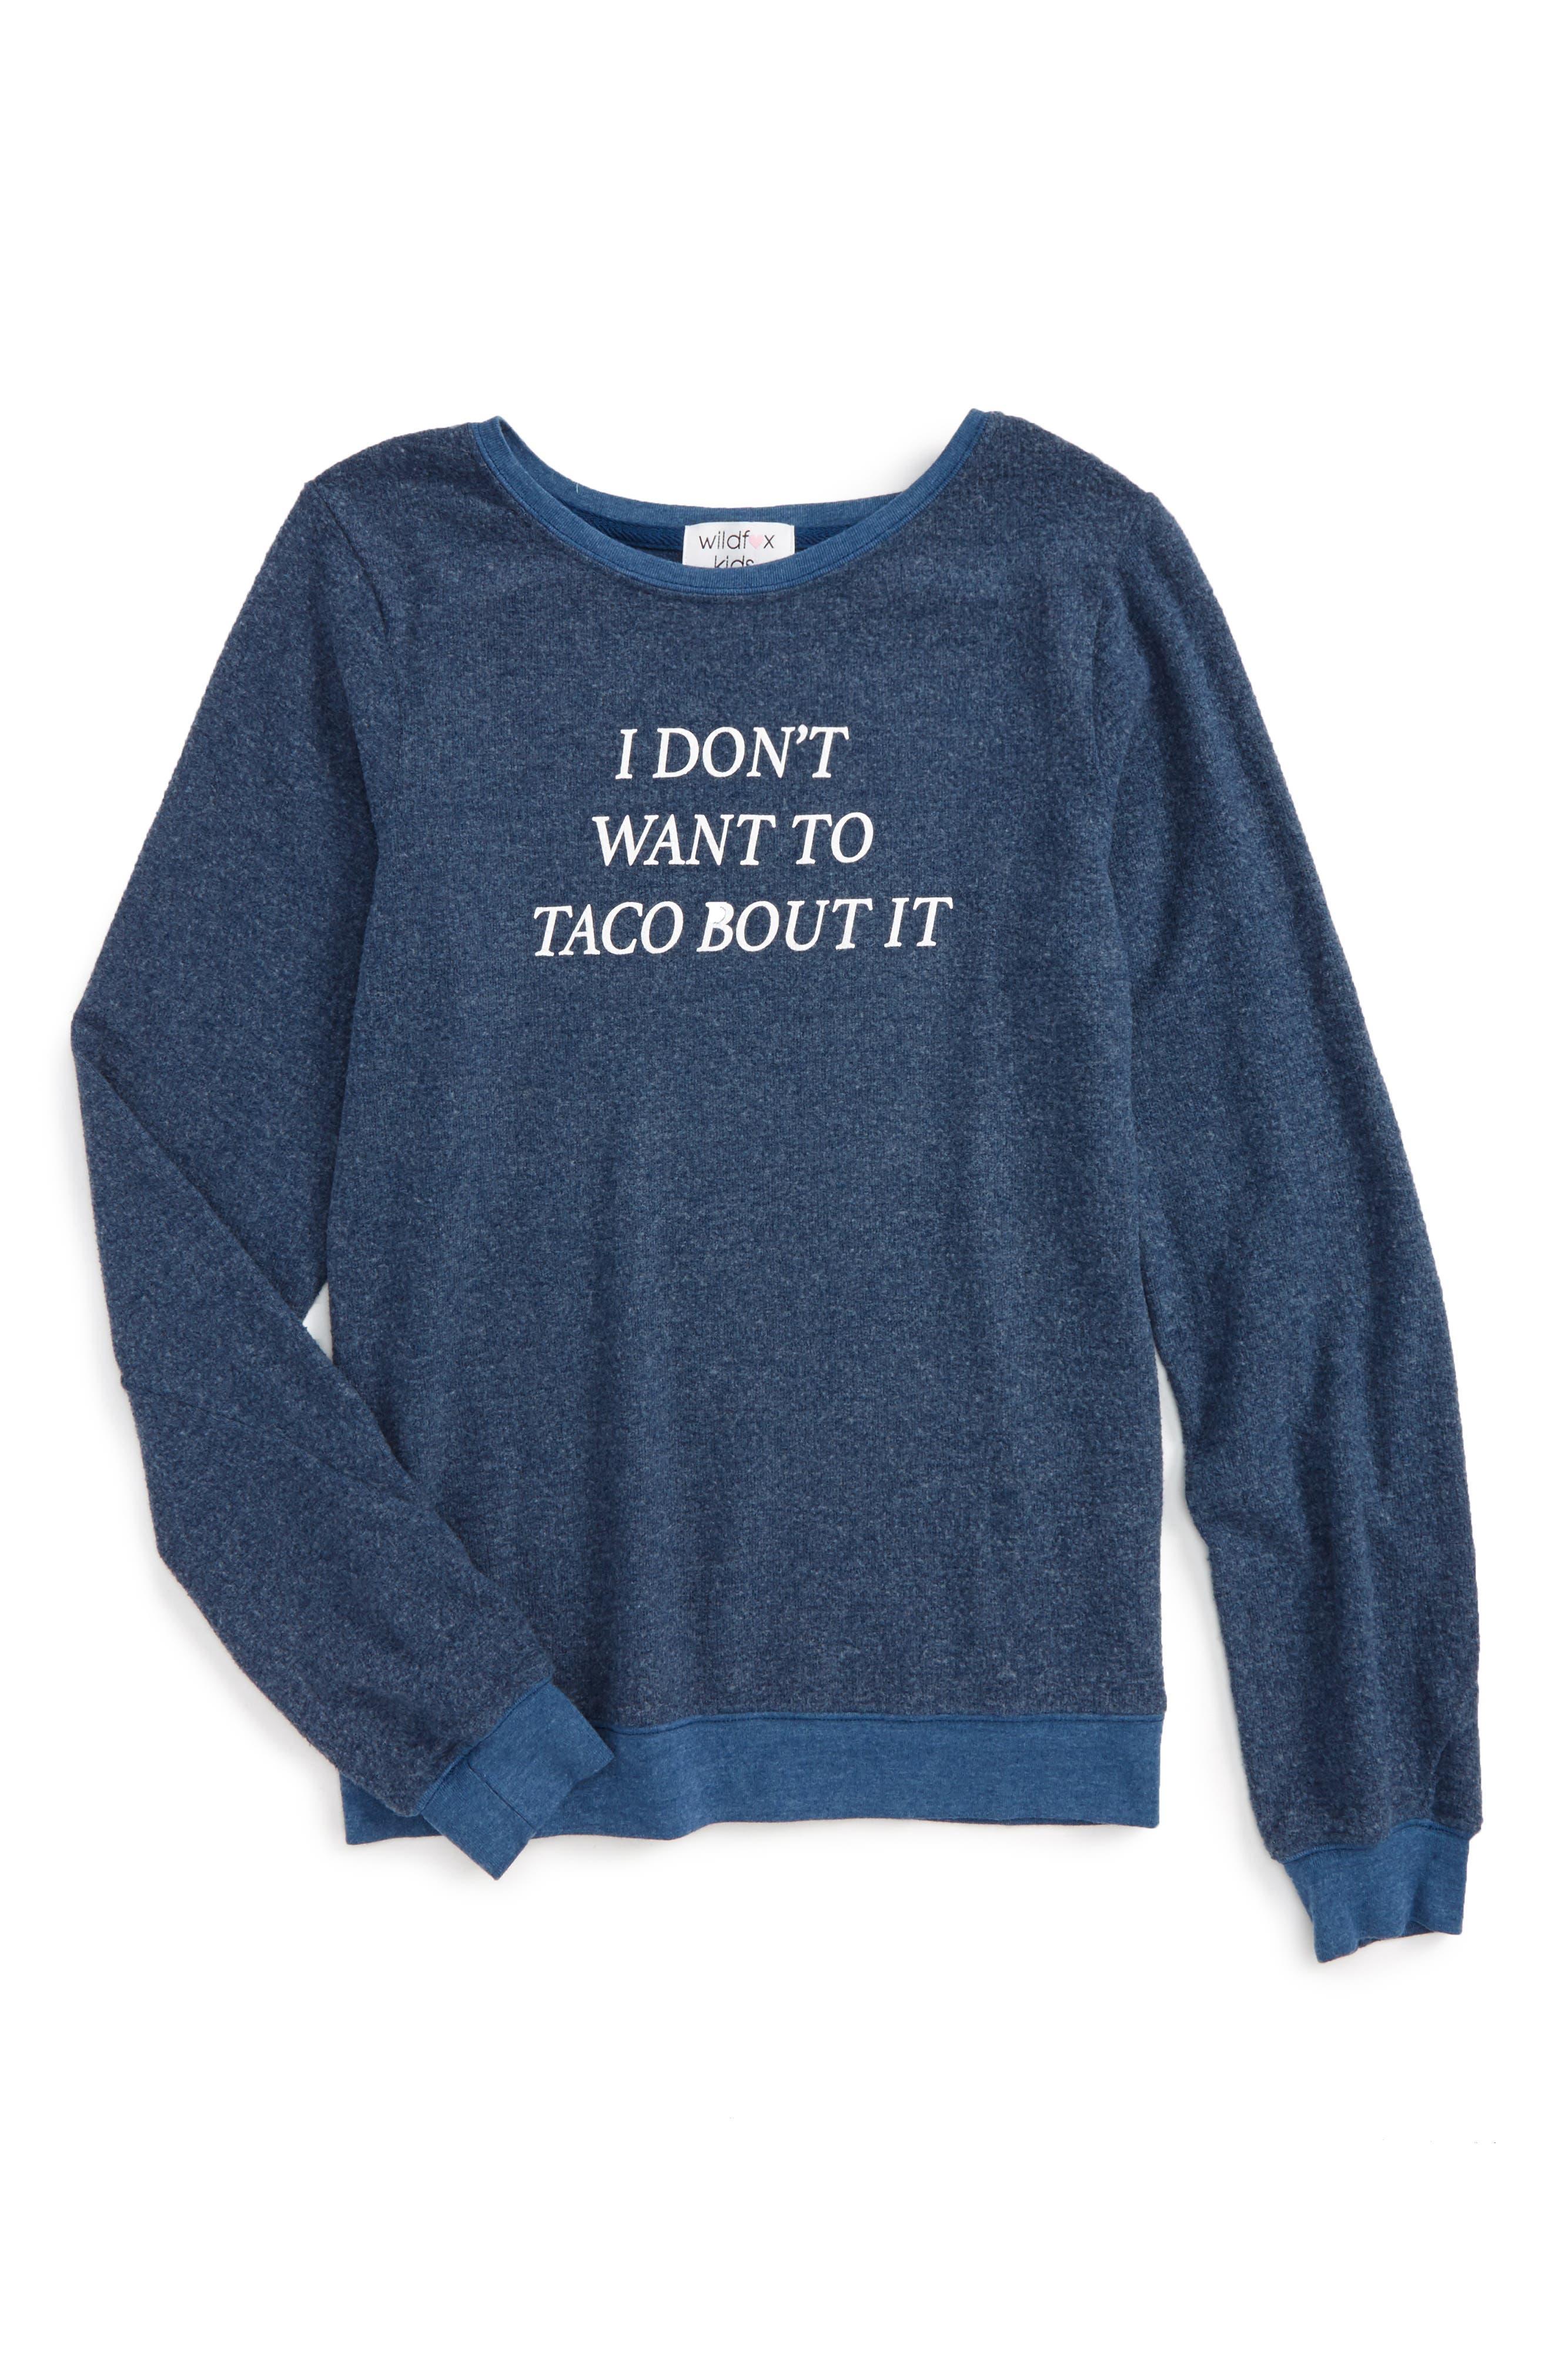 Baggy Beach Jumper - Taco Talk Pullover,                         Main,                         color, Galaxy Blue